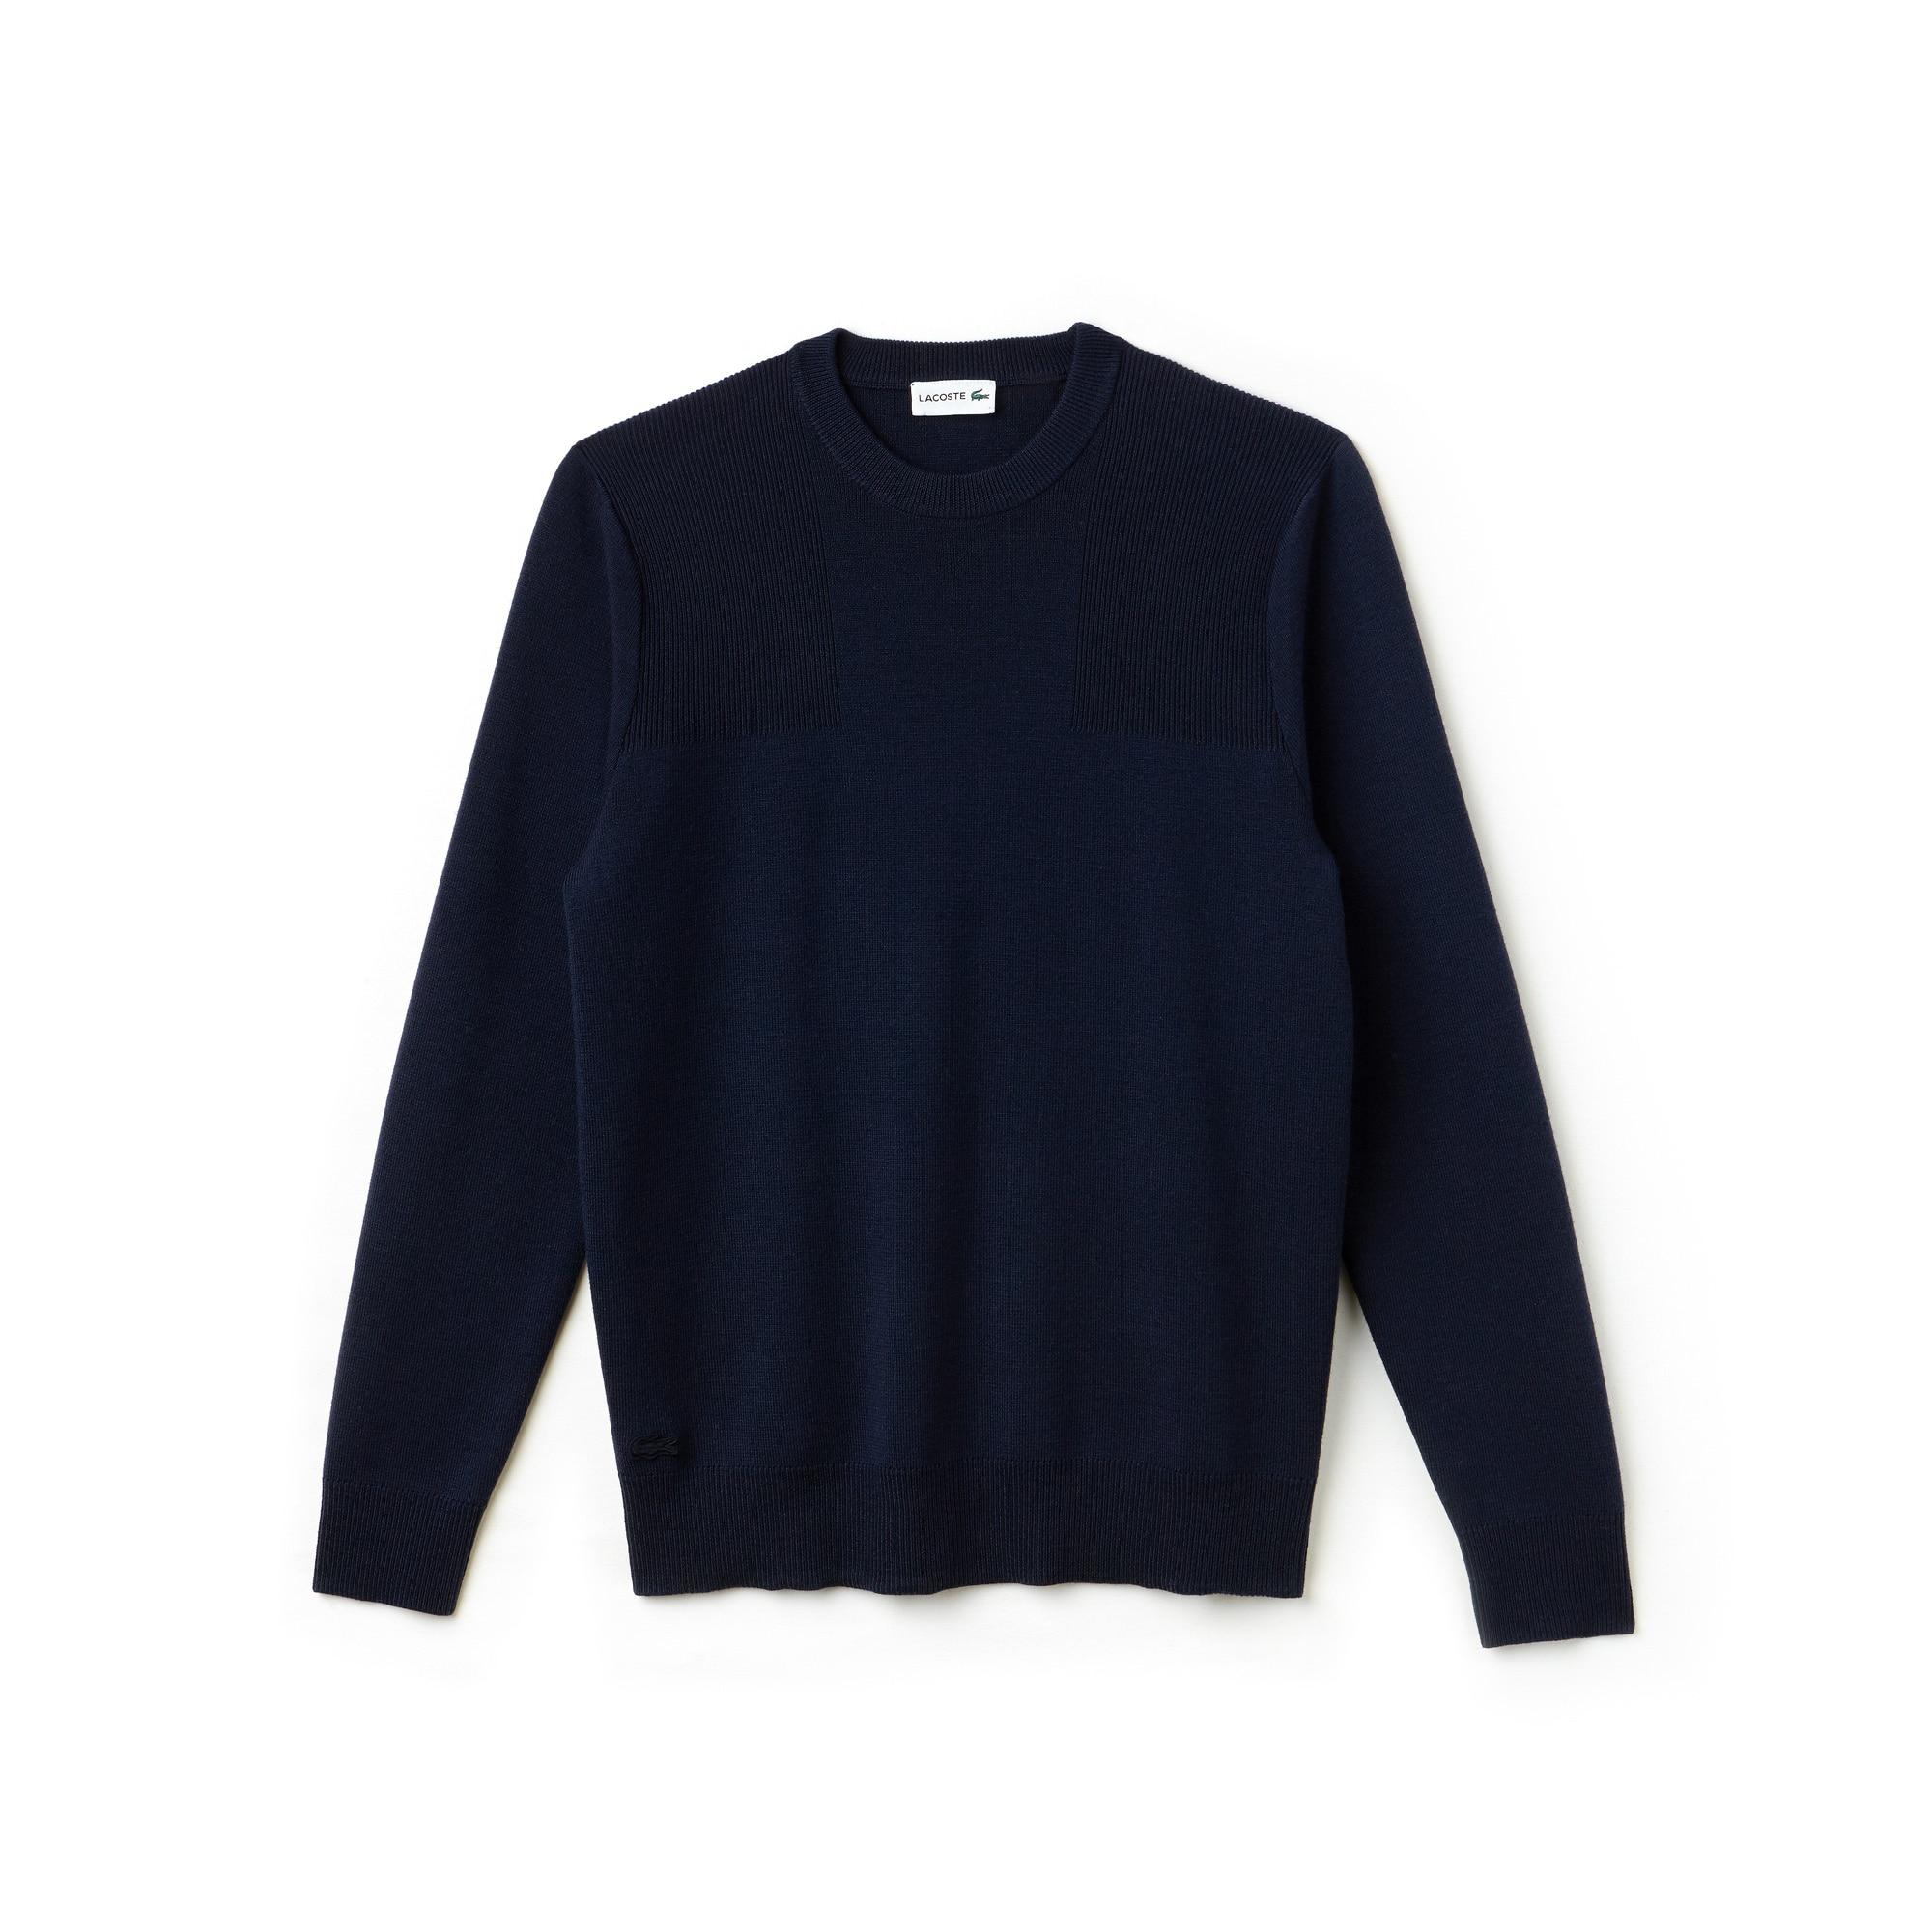 Men's Crew Neck Technical Knit Sweater